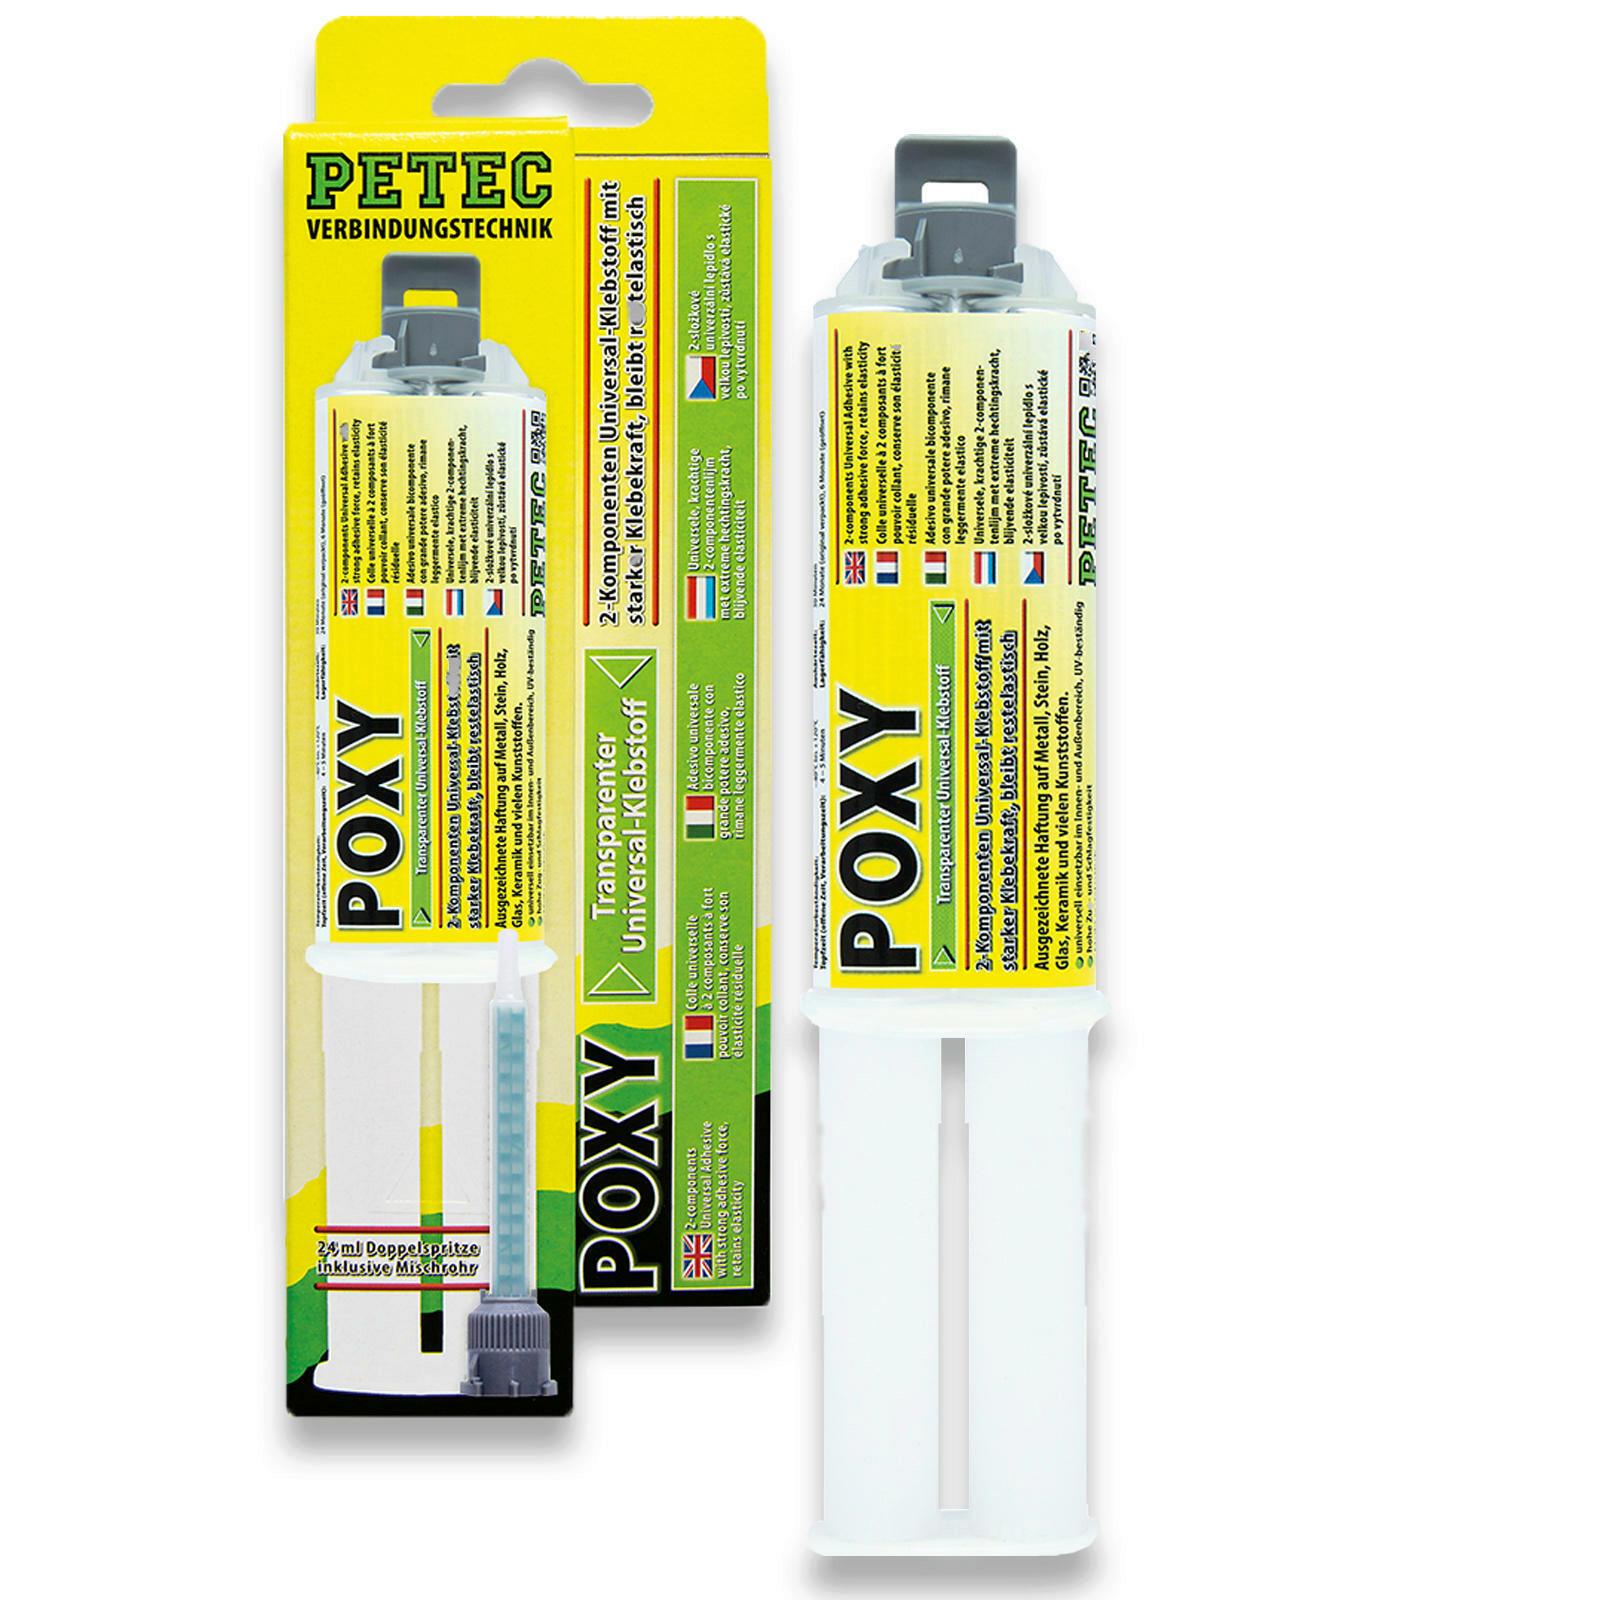 PETEC Flüssigmetall Poxy 24ml Universalkleber